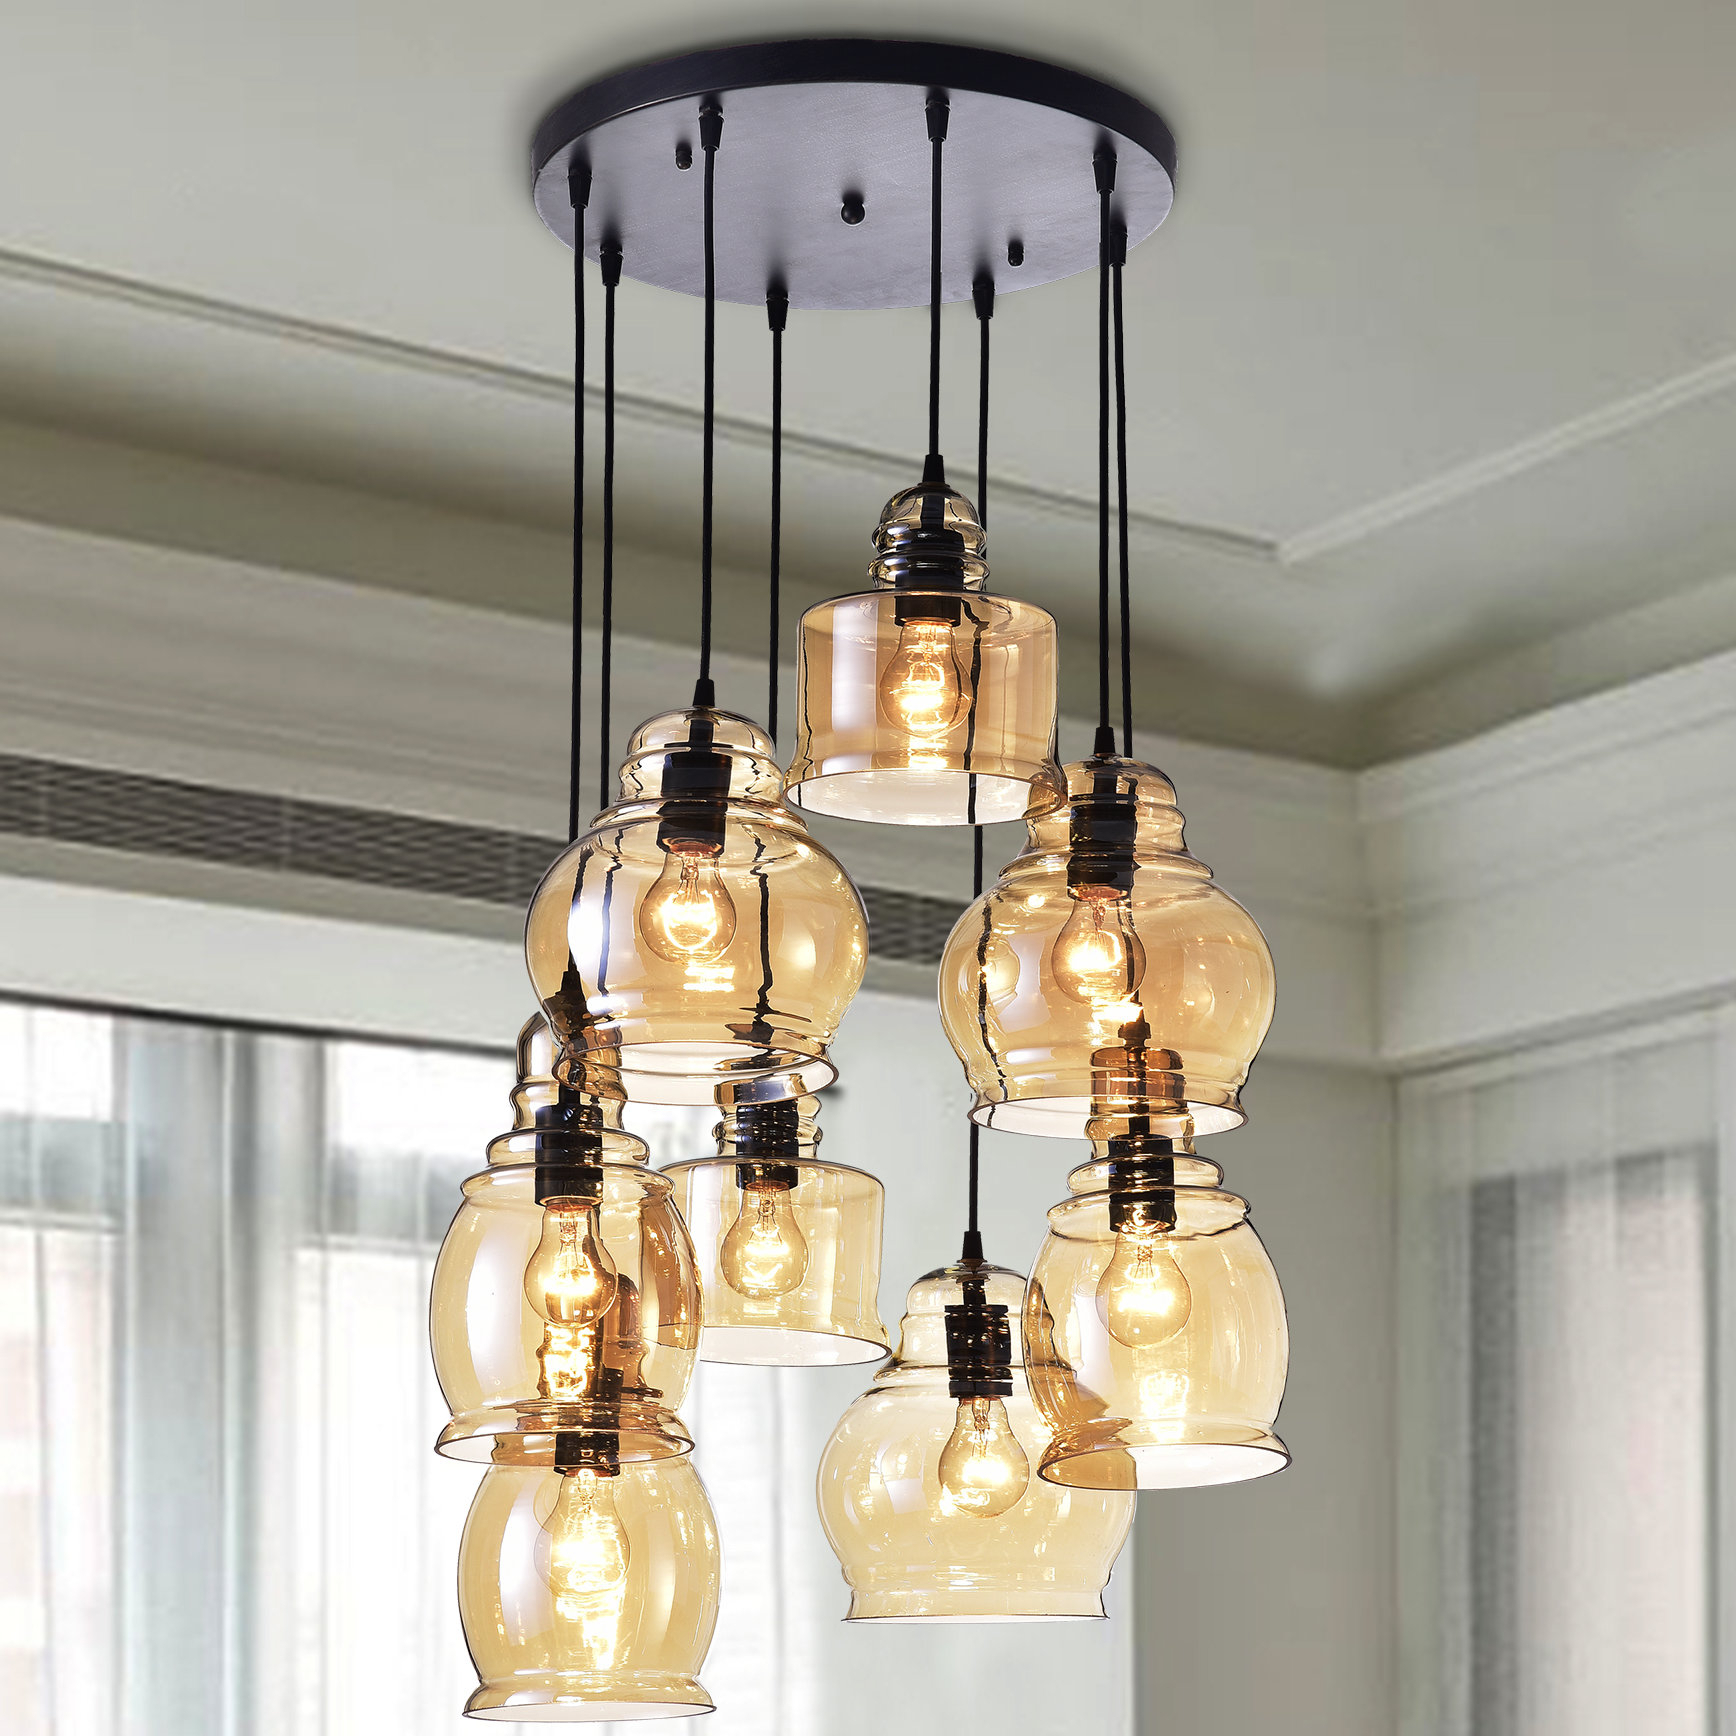 Cherrie 8 Light Cluster Bell Pendant Throughout Pruett Cognac Glass 8 Light Cluster Pendants (View 13 of 30)